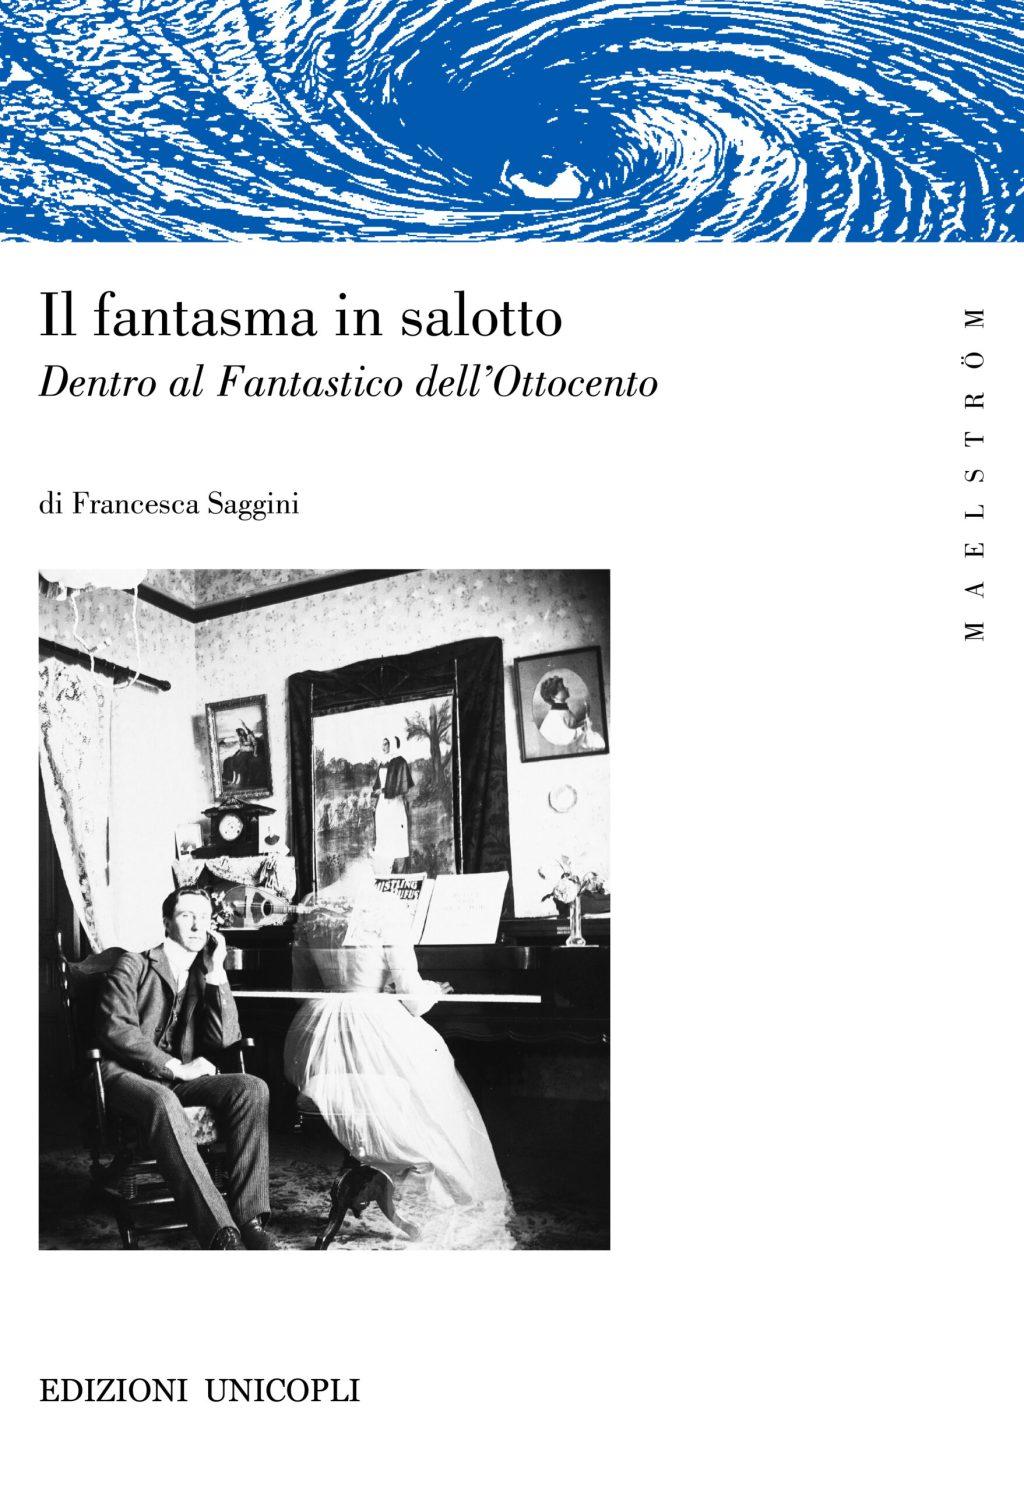 Francesca Saggini